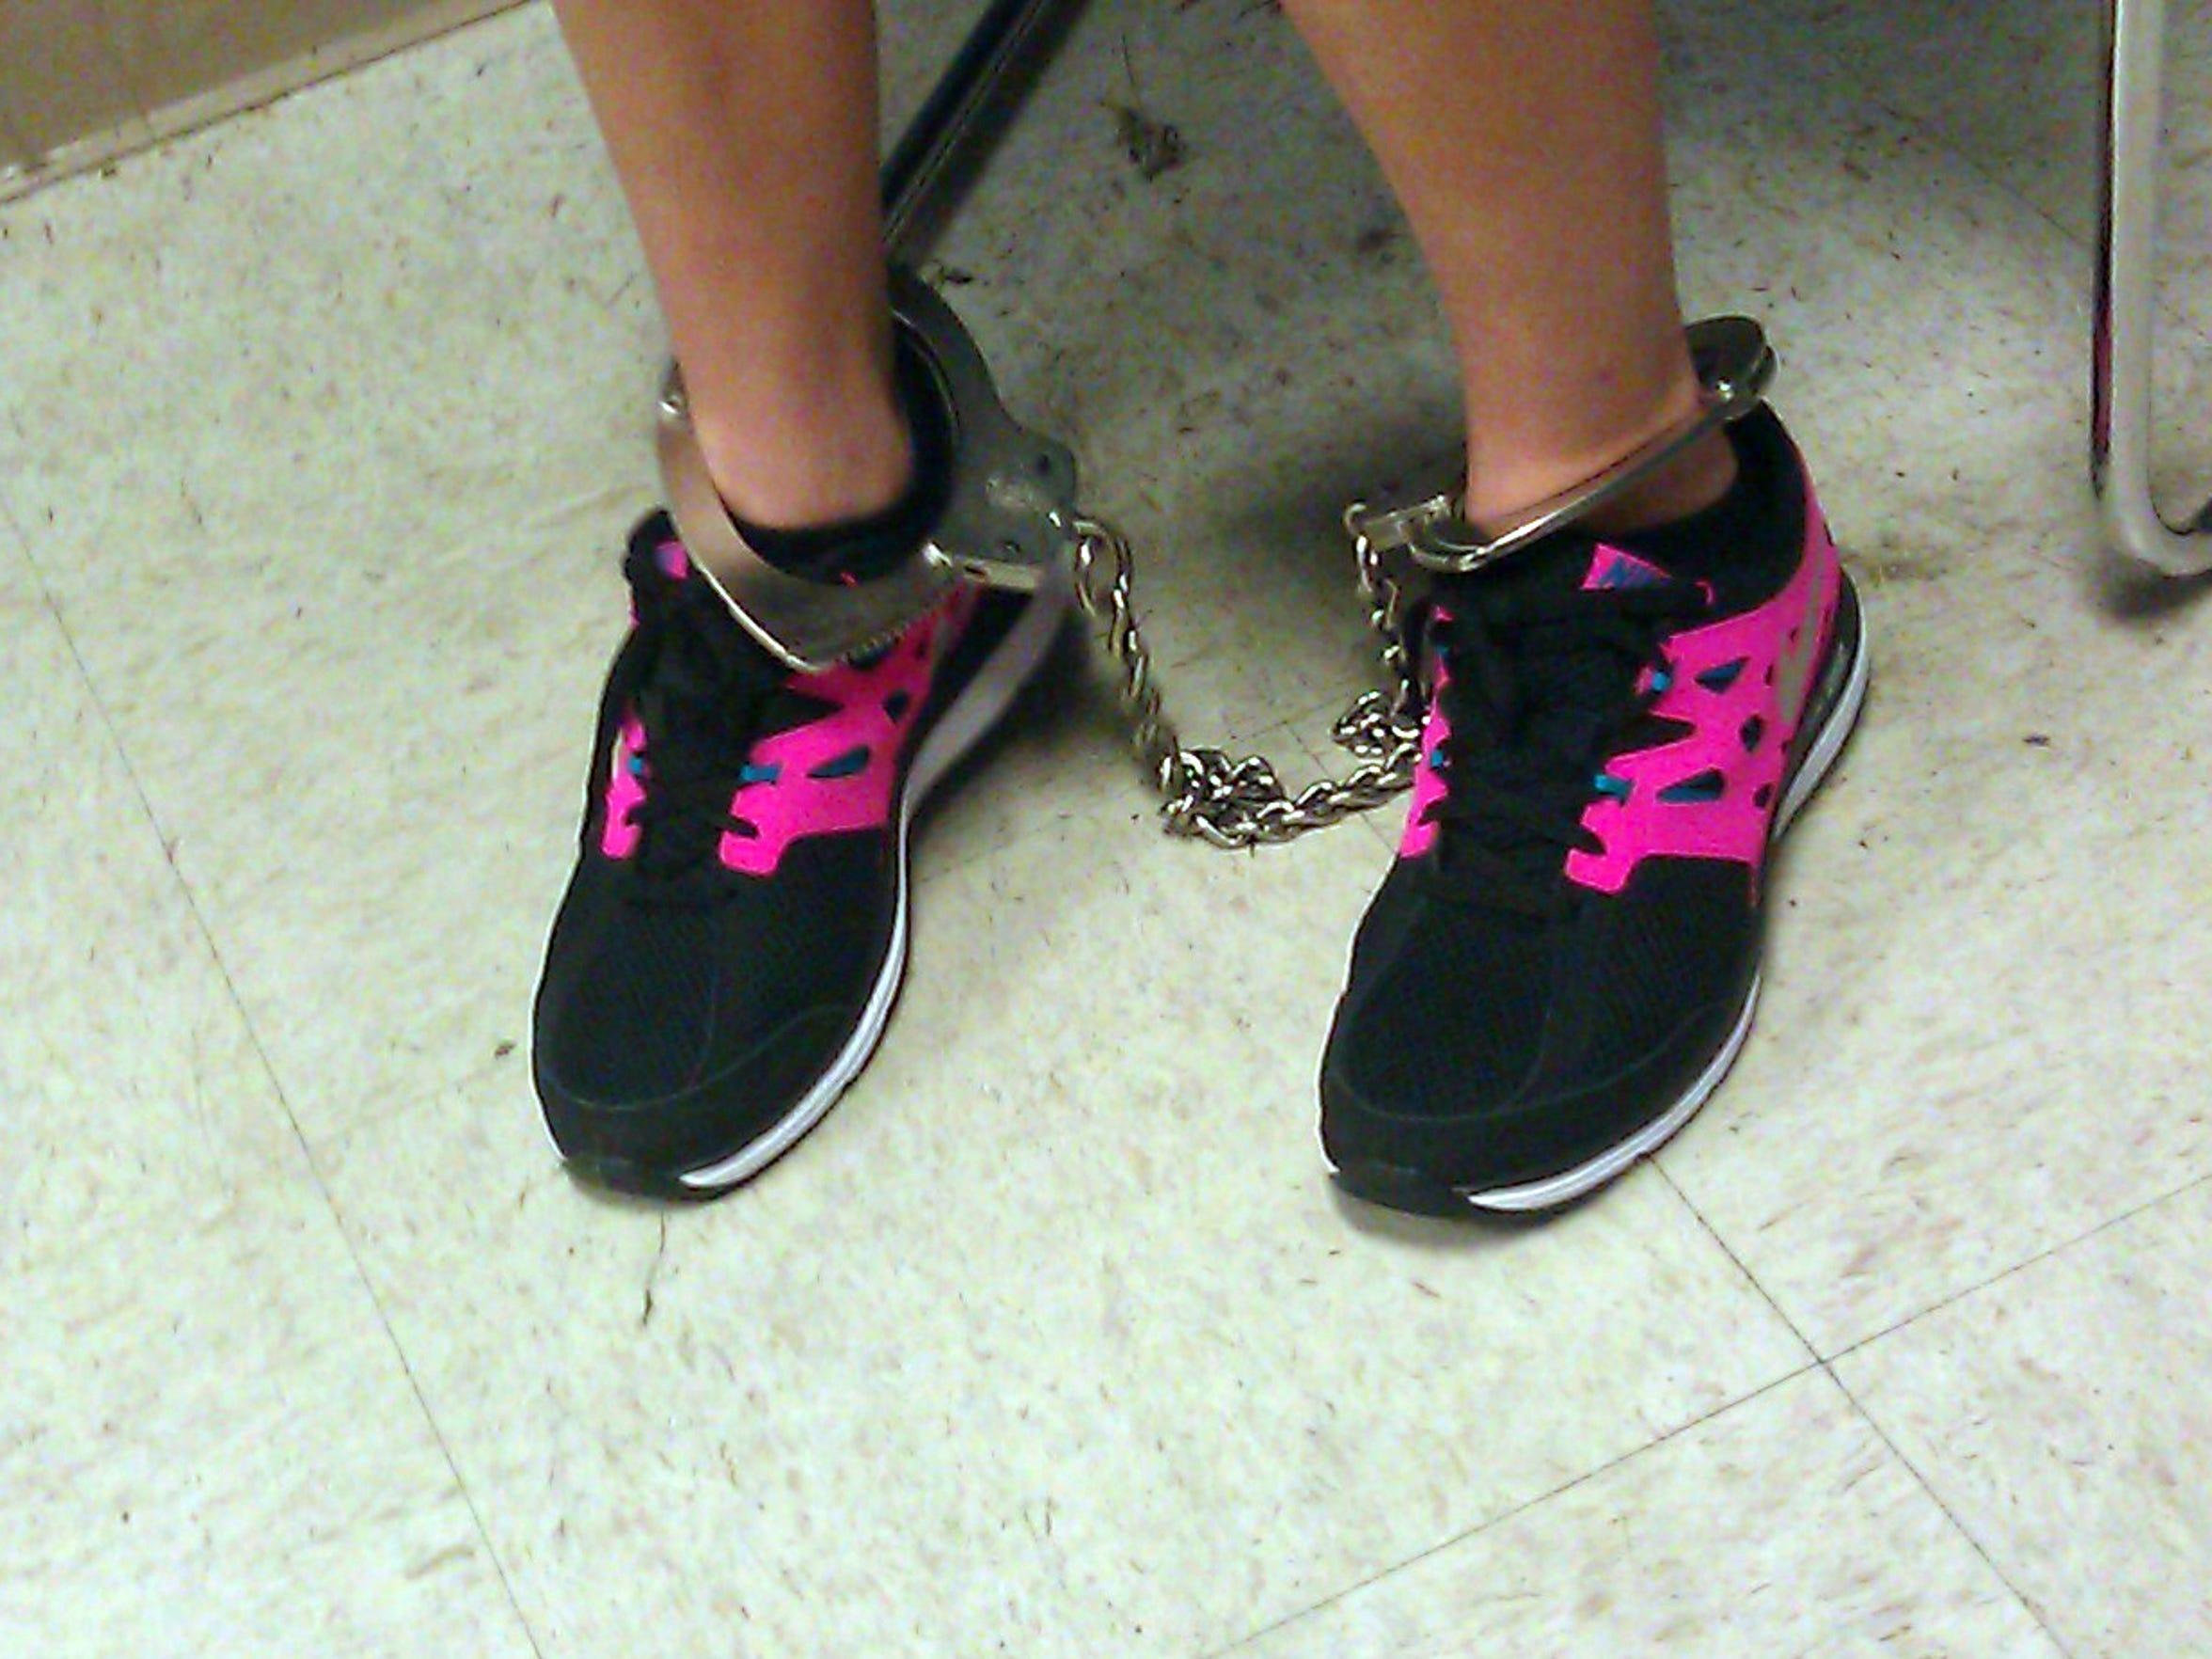 Shoplift_Shoes